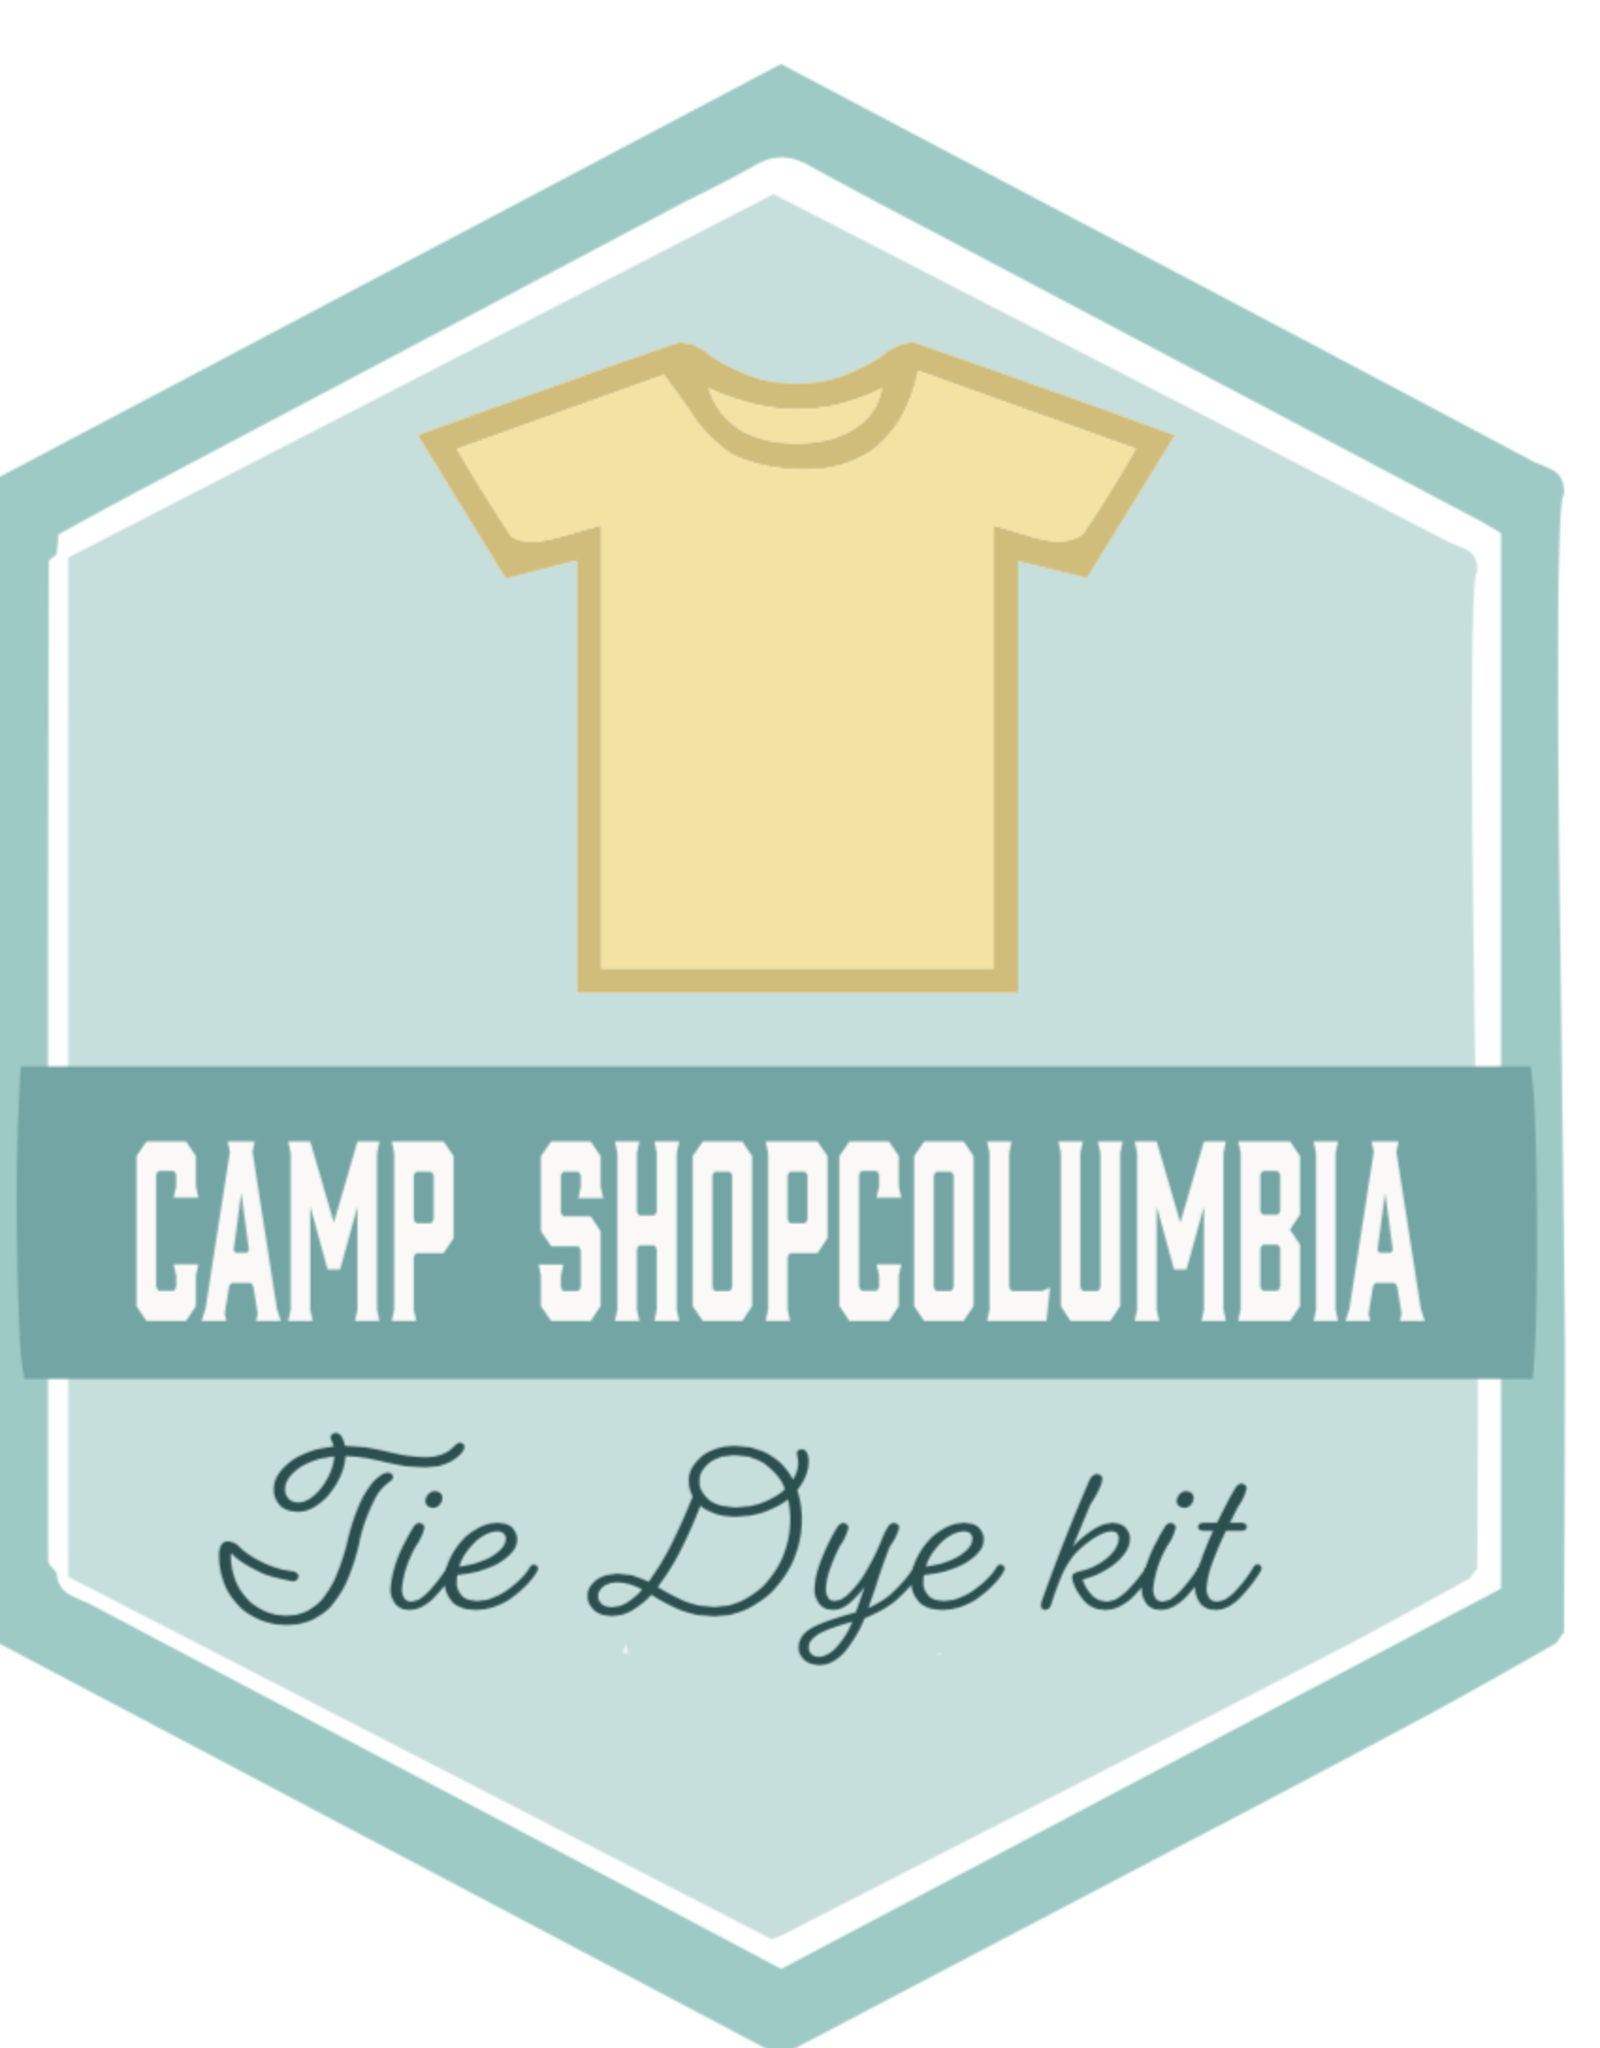 Buy Columbia, By Columbia Camp ShopColumbia Columbia Logo T-shirt and Tie Dye Kit